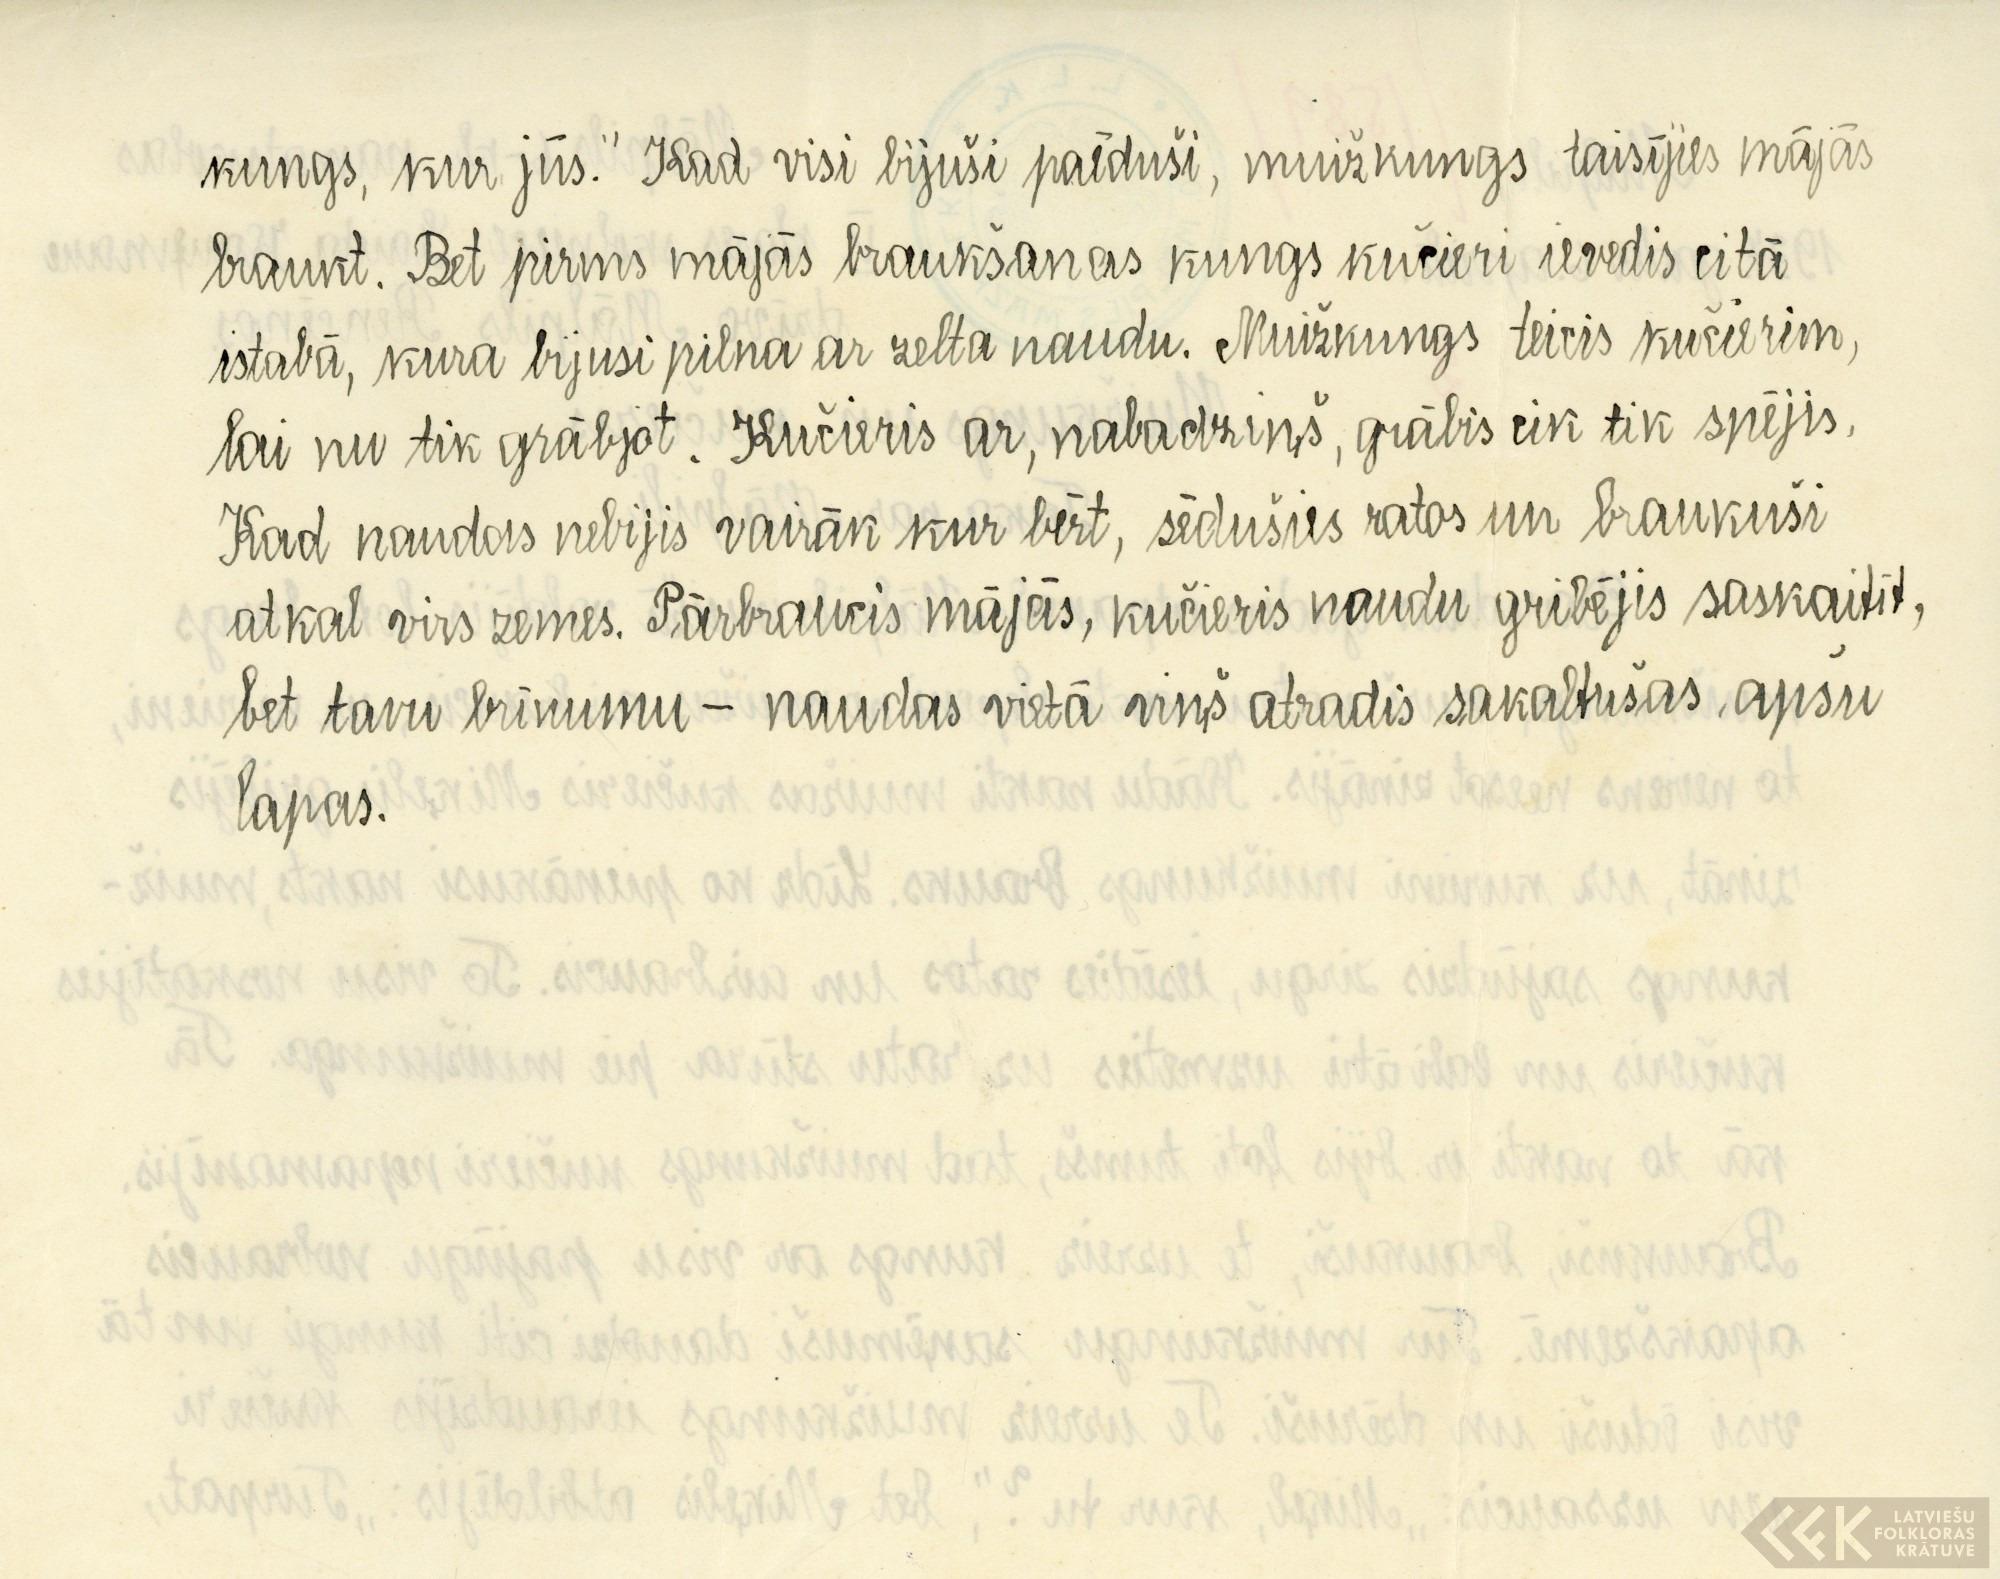 1589-Malpils-mazpulks-01-0004